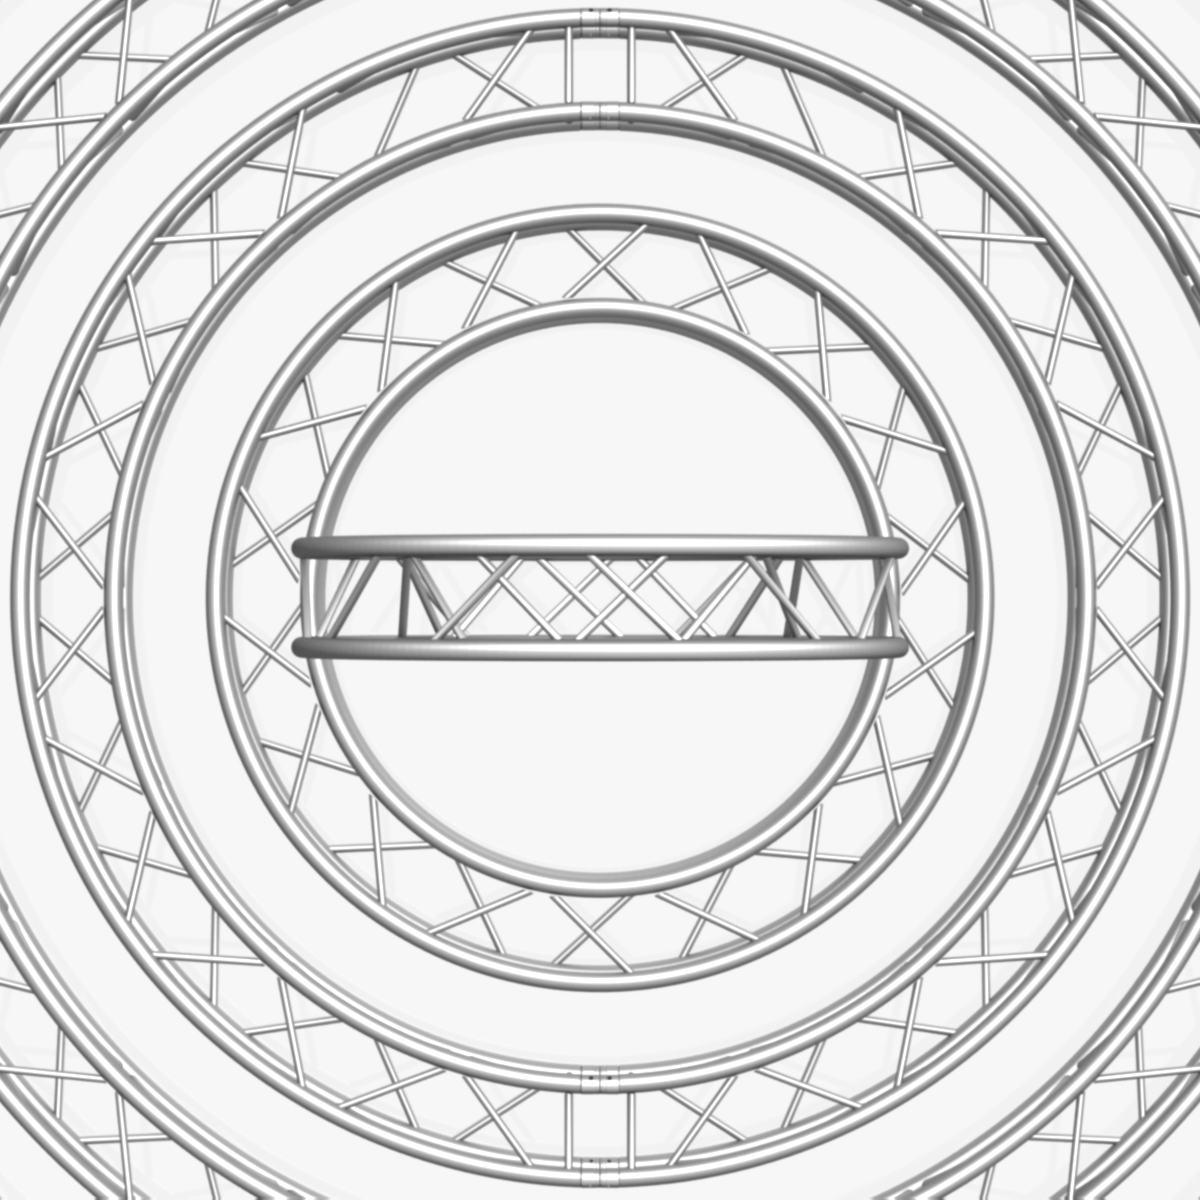 circle square truss modular collection 3d model 3ds max dxf fbx c4d dae  texture obj 252348